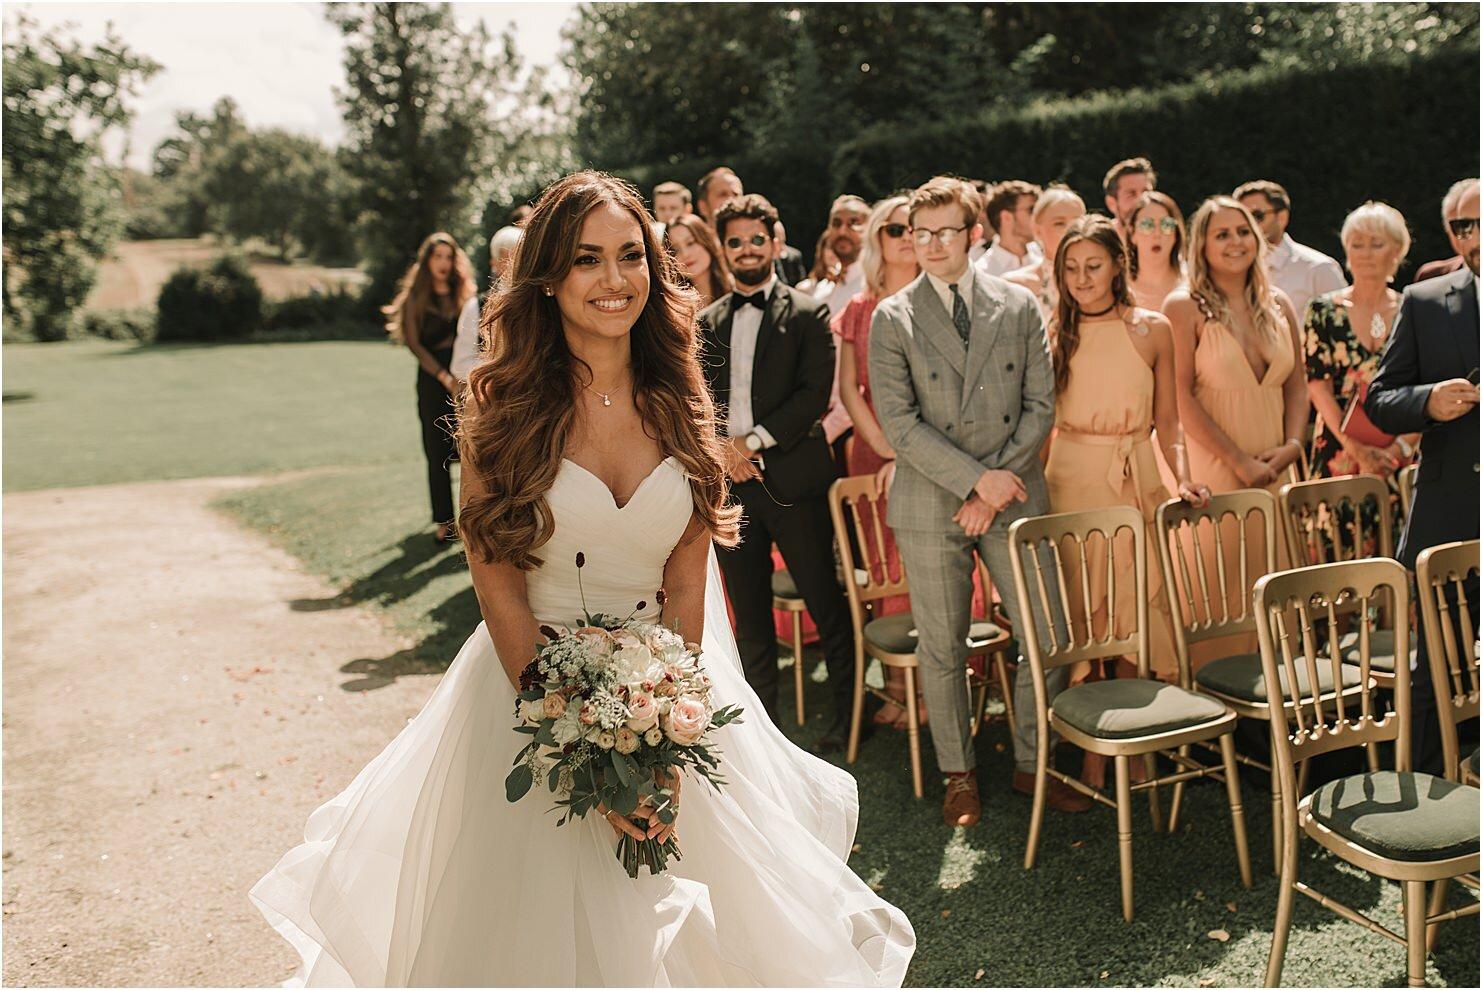 boda-de-cuento-en-castillo-boda-en-londres-49.jpg